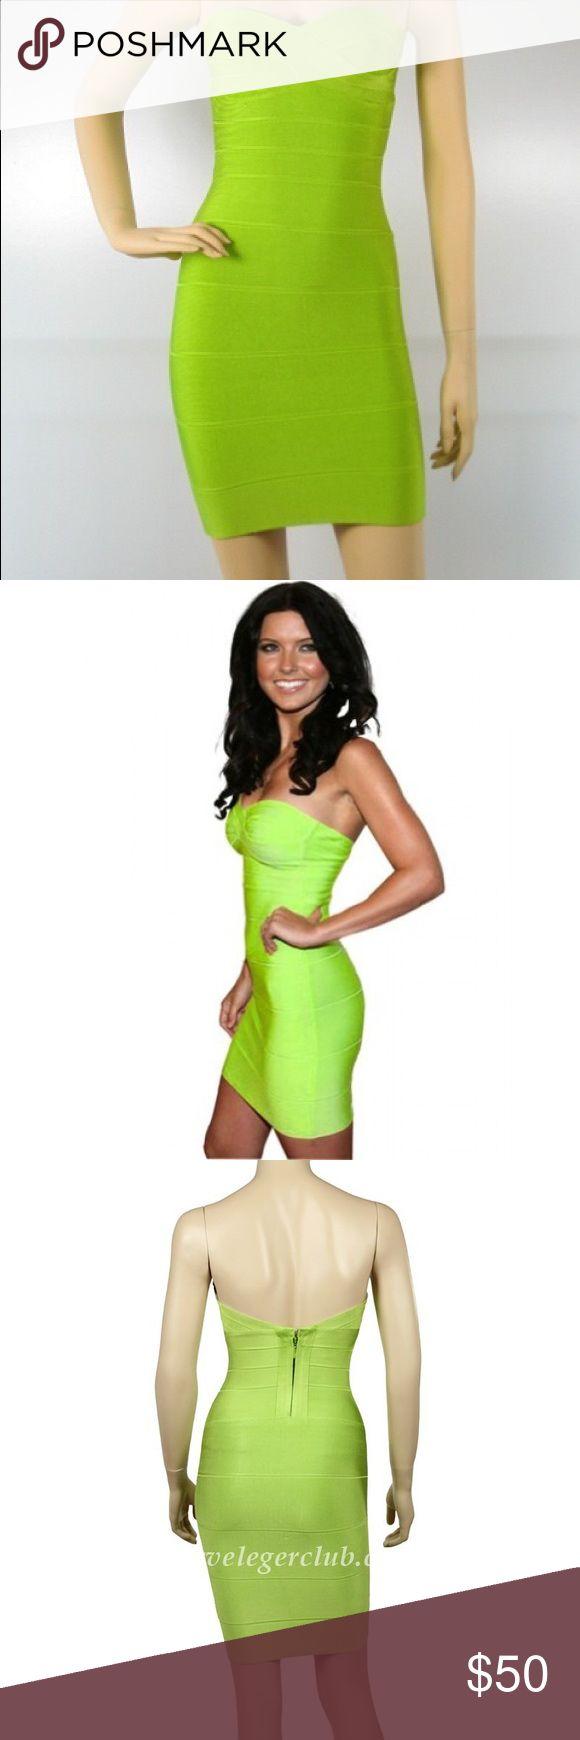 Lime Green Bandage Dress sz S. Final price! Lime Green Bandage Dress sz S. Worn once. Excellent condition meilun Dresses Mini